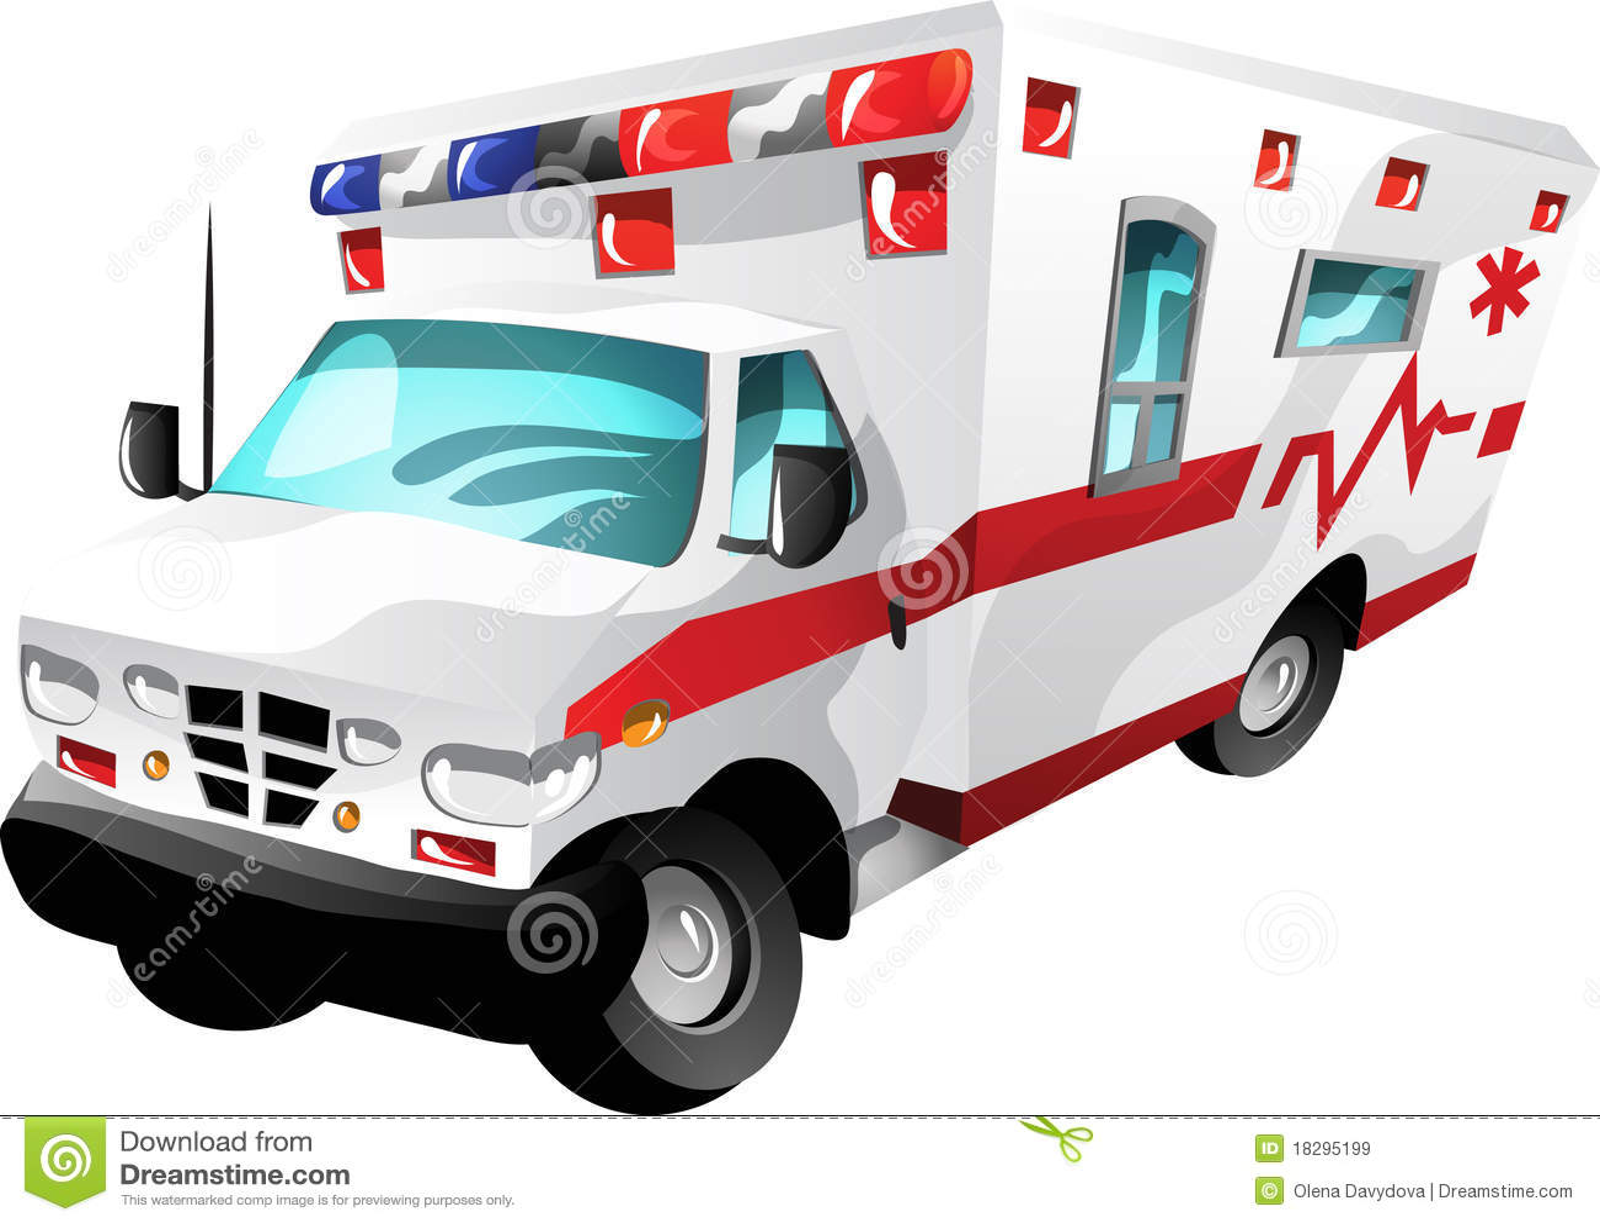 Cartoon Ambulance Stock Vector Illustration Of Equipment 18295199